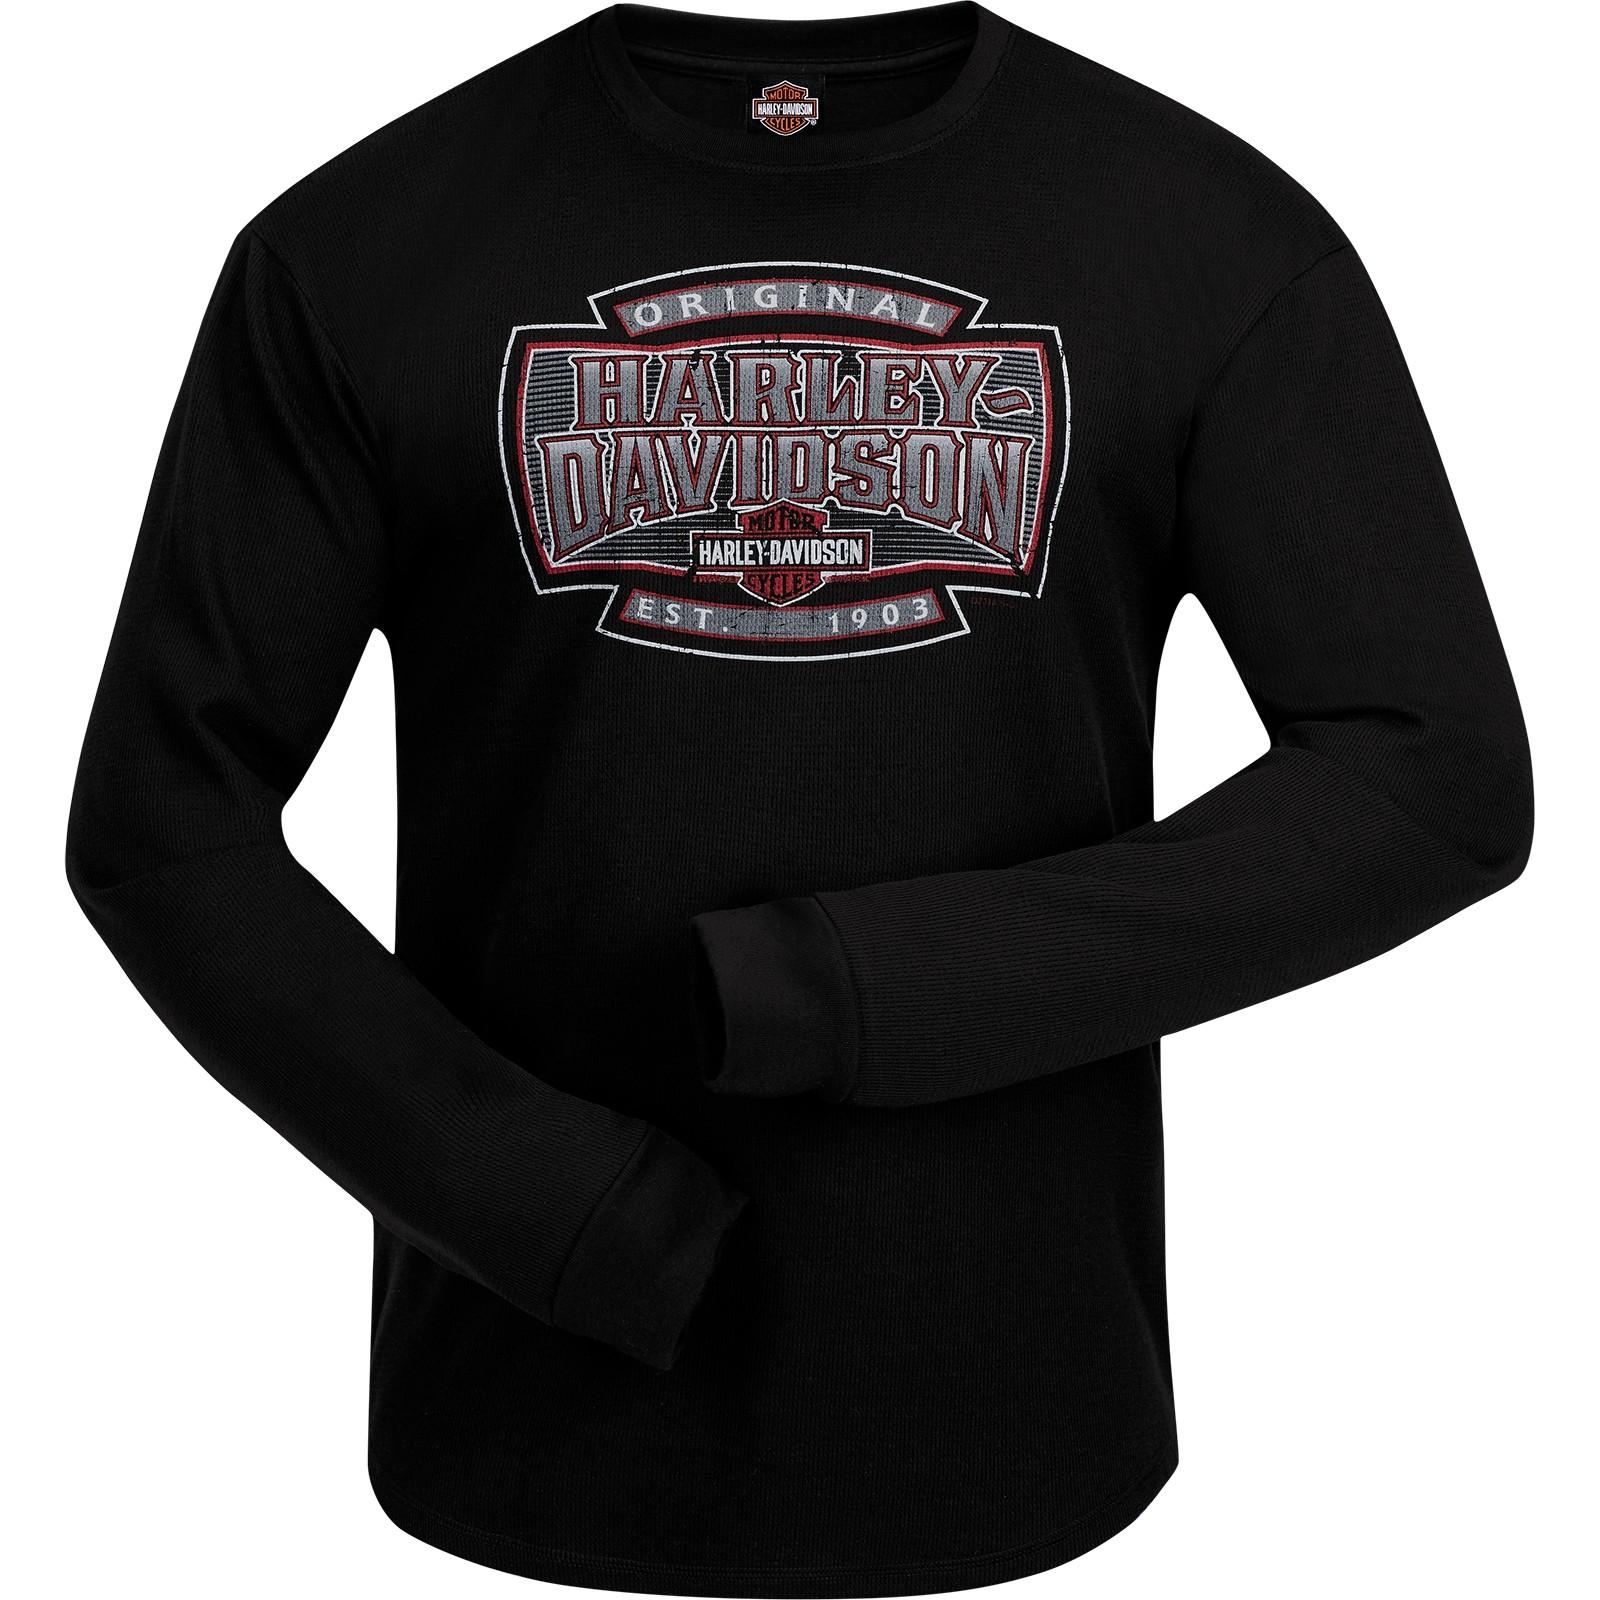 Harley-Davidson Men's Long Sleeve Thermal Shirt with Round Hem - Ramstein Air Base | H-D Shield